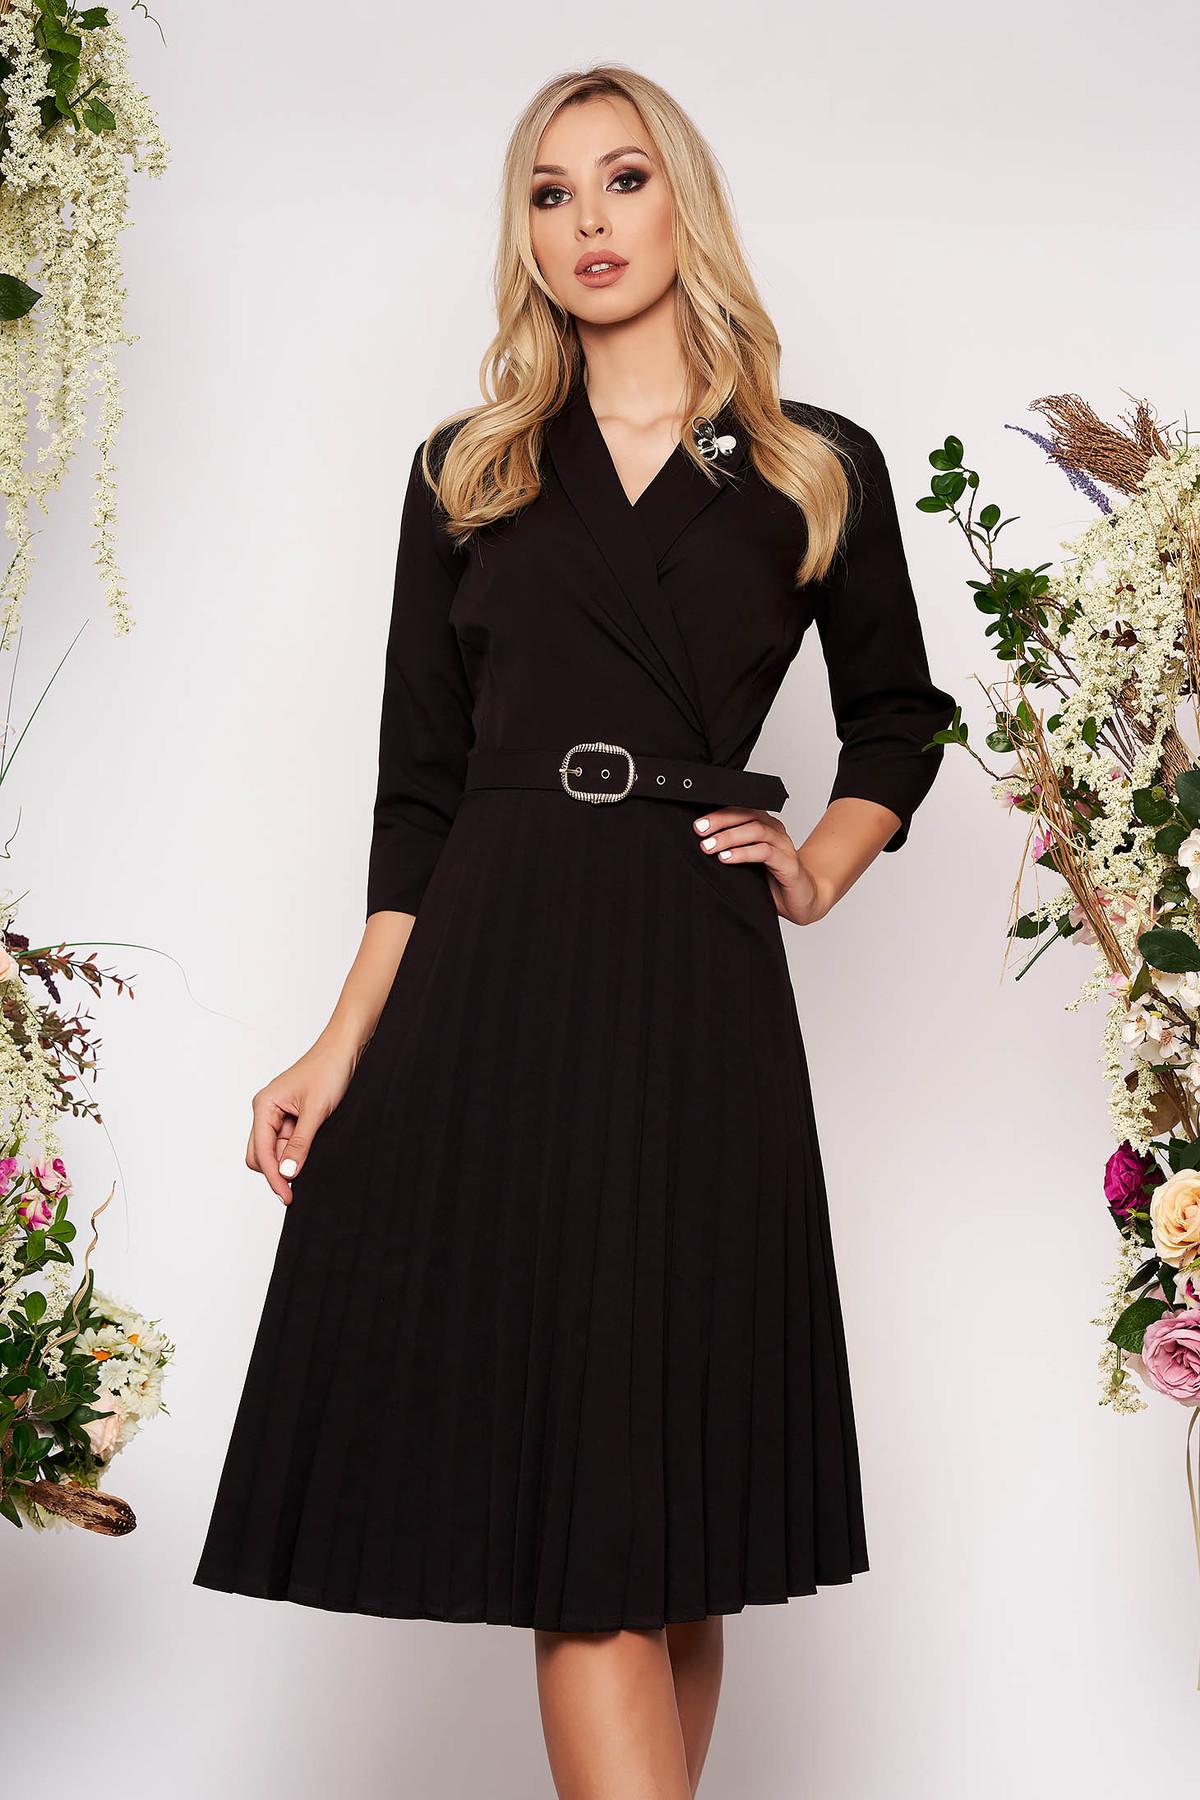 Rochie neagra eleganta midi in clos din stofa subtire plisata cu decolteu petrecut accesorizata cu brosa si curea